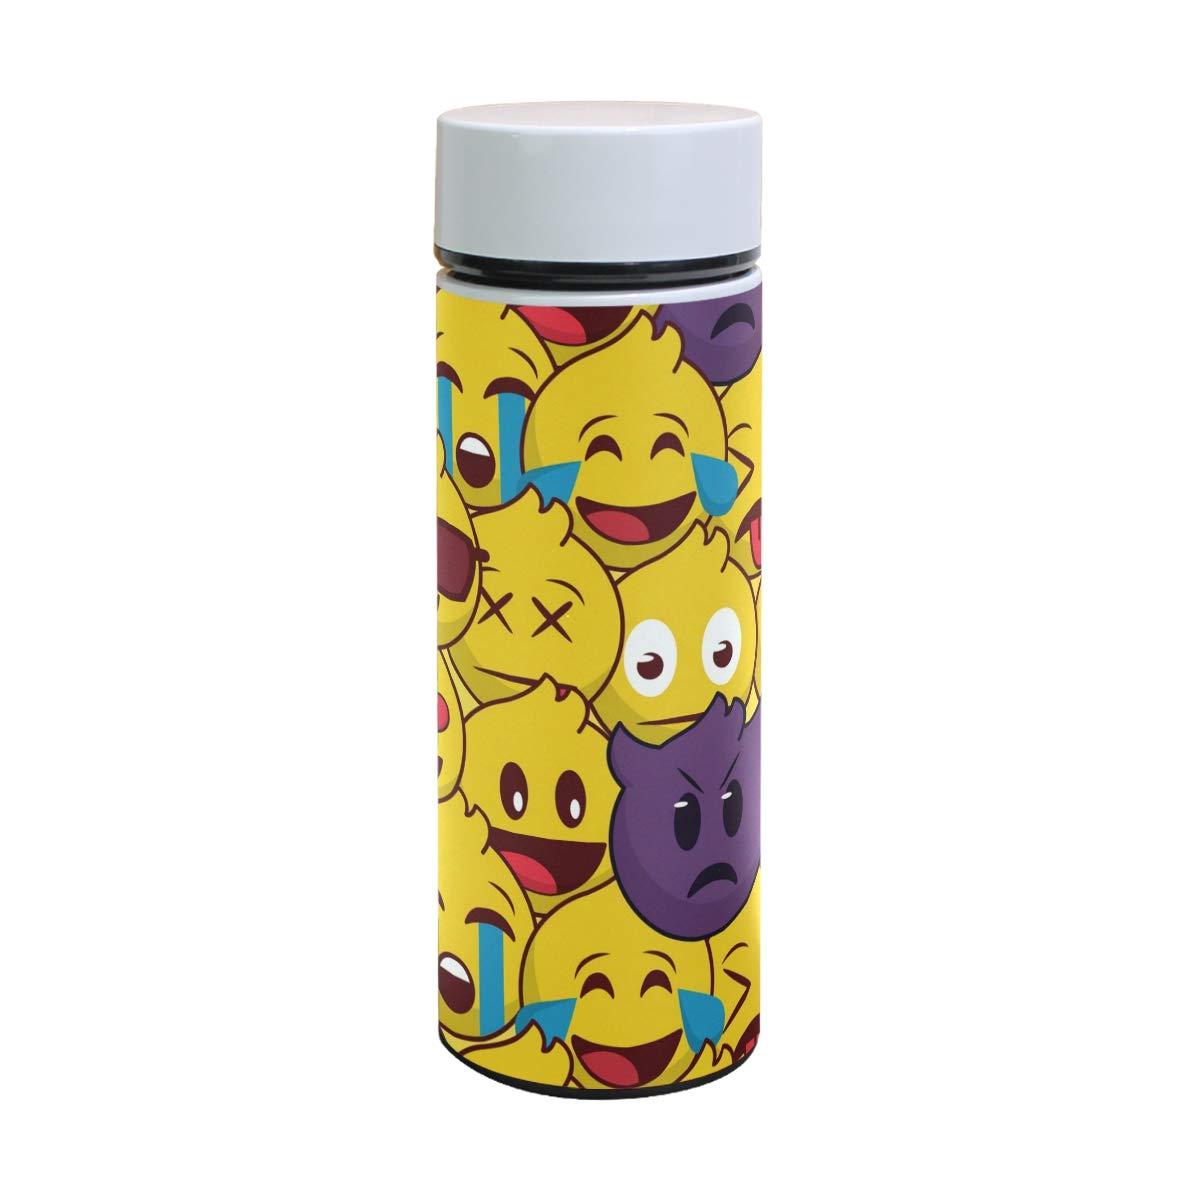 Amazon.com: Cute Emoji Pattern Stainless Steel Vacuum ...